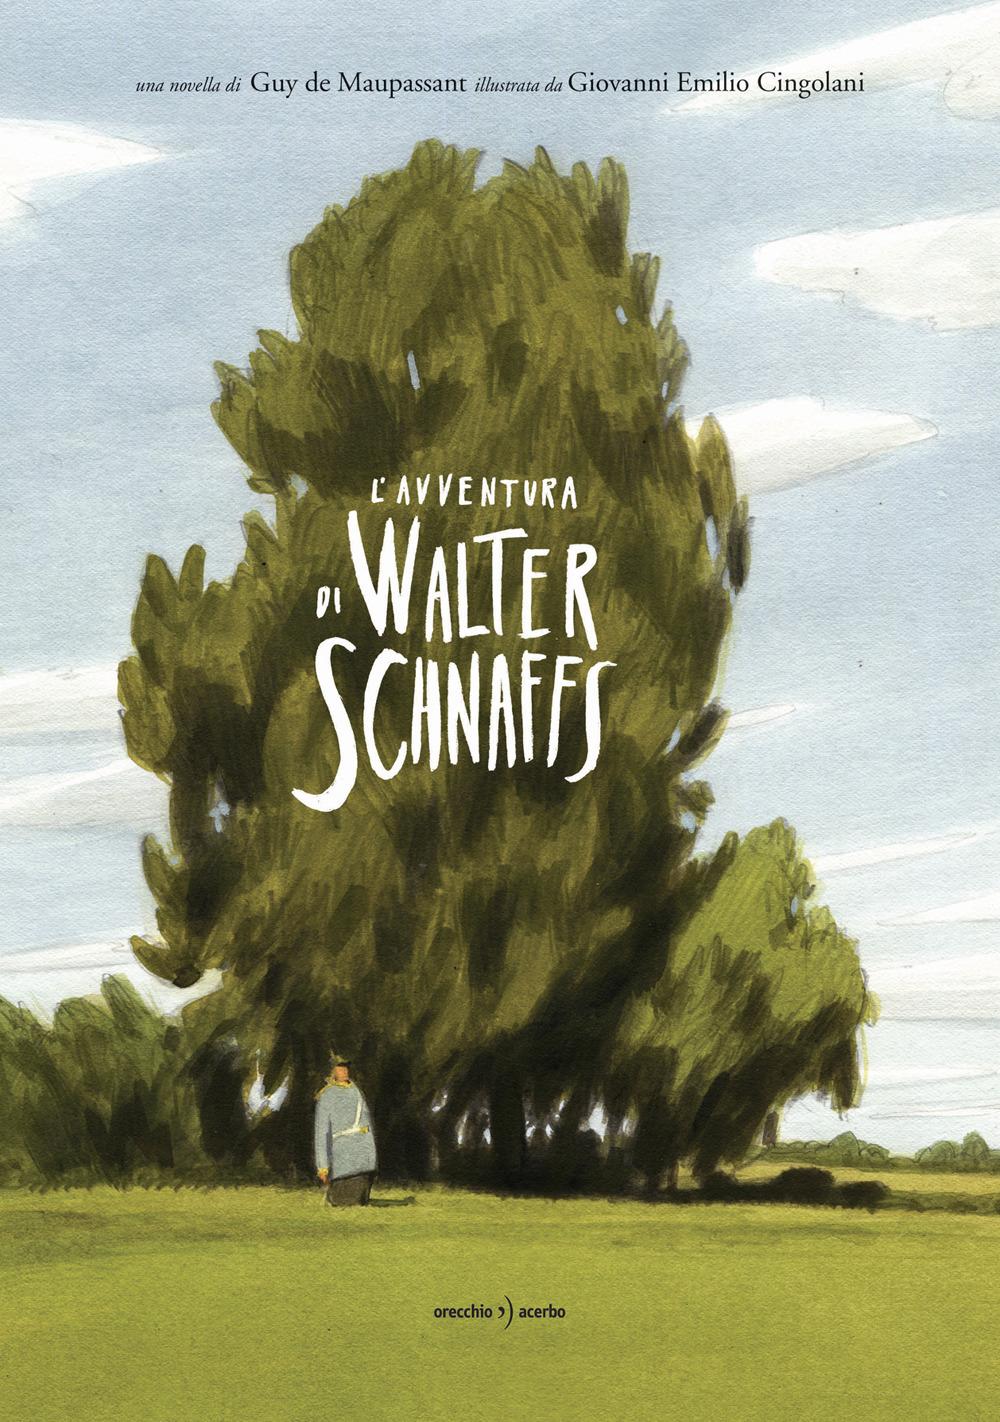 L'avventura di Walter Schnaffs